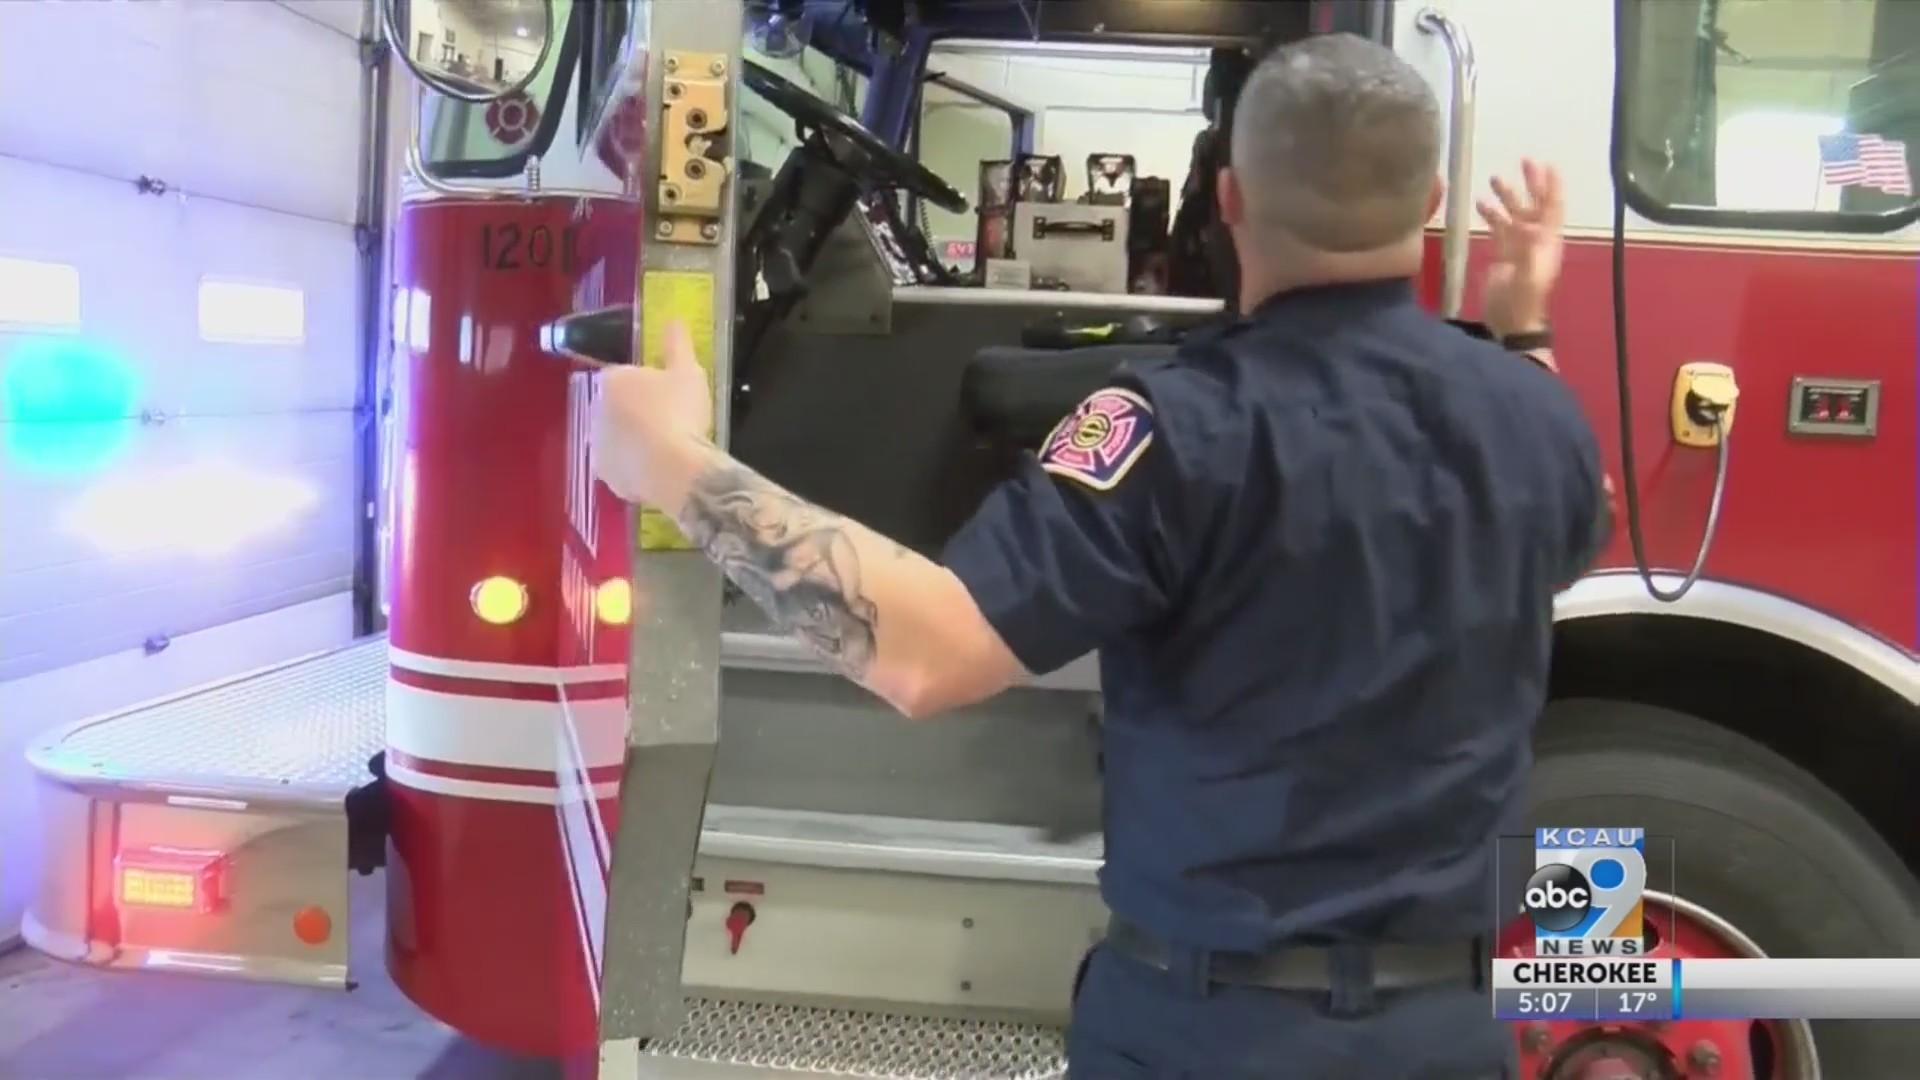 Firefighters Donate 'Movember' Money